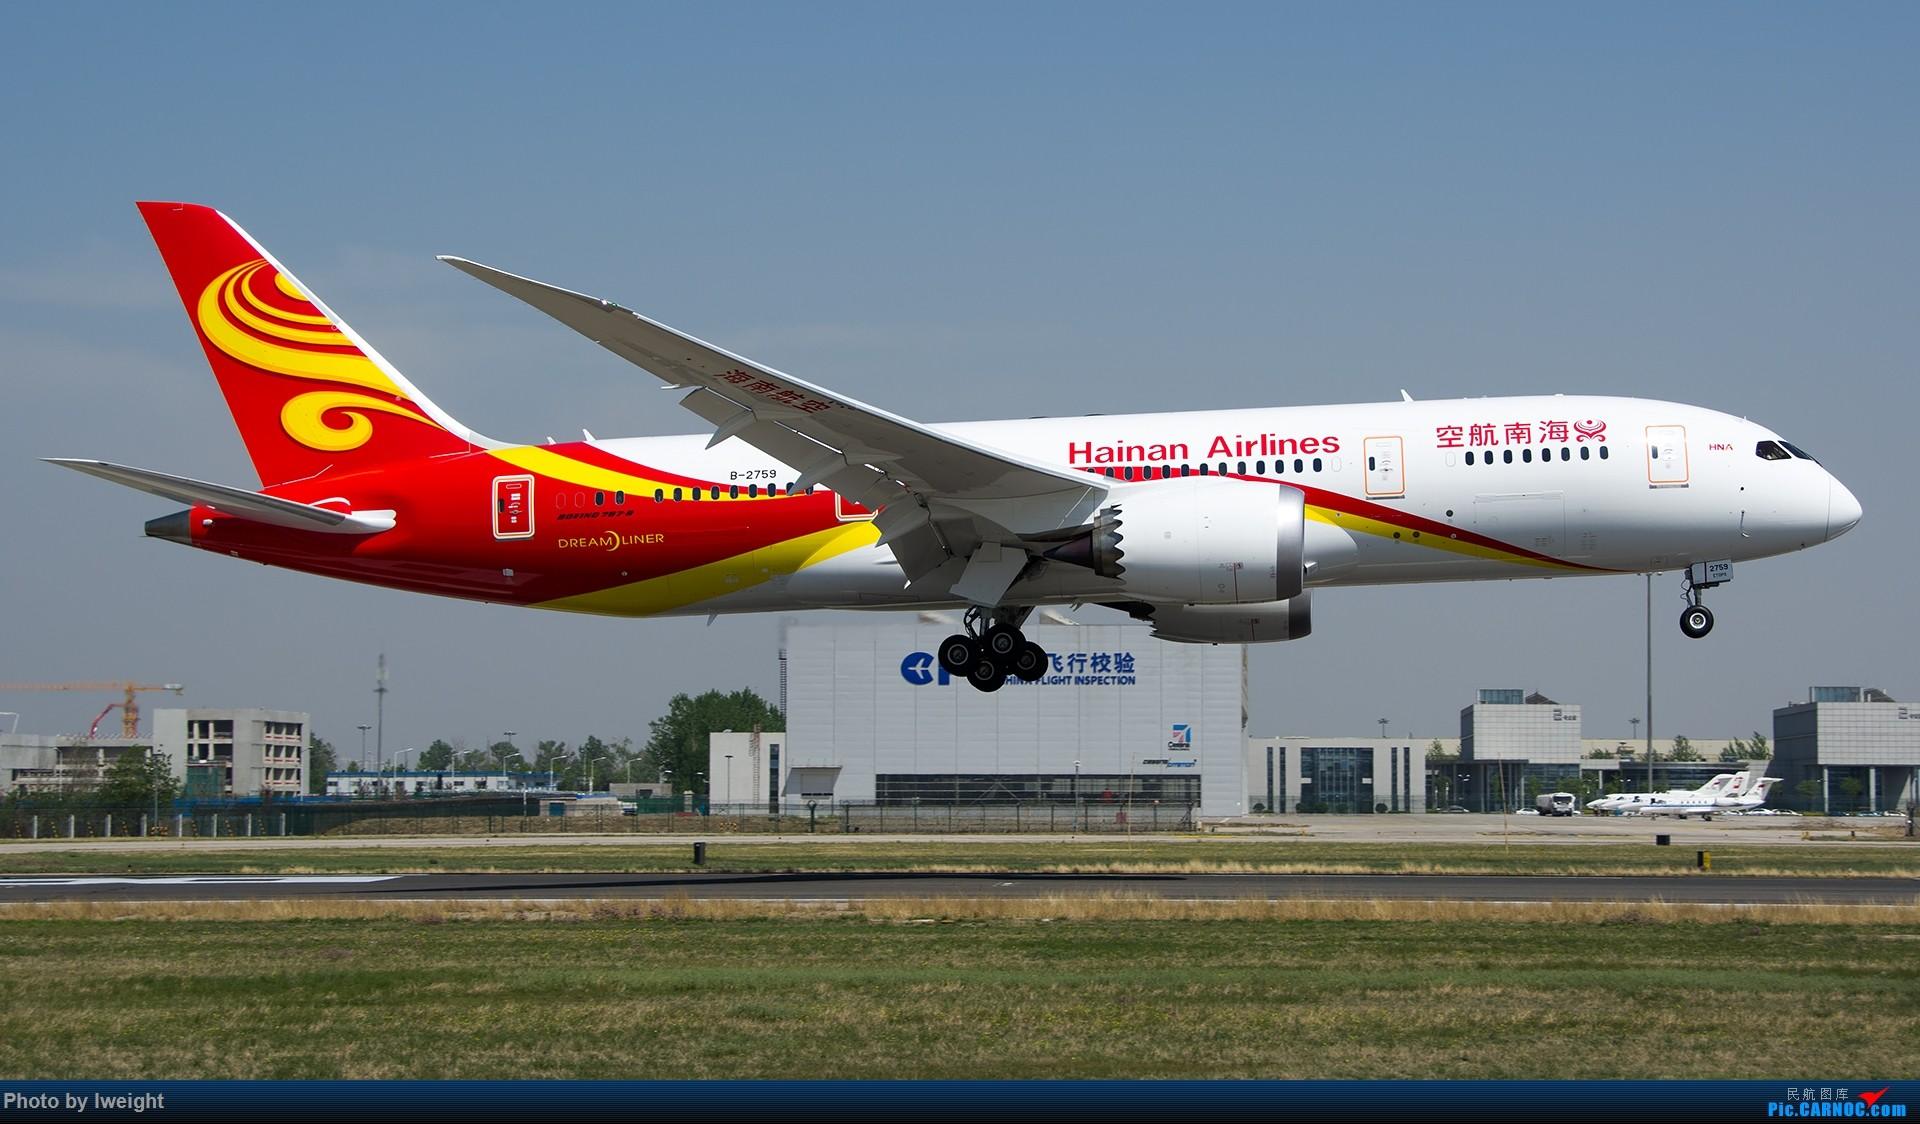 Re:[原创]2015年第一次在PEK拍北向南,其实是为Jimmy去的【2015-4-24】 BOEING 787-8 B-2759 中国北京首都国际机场